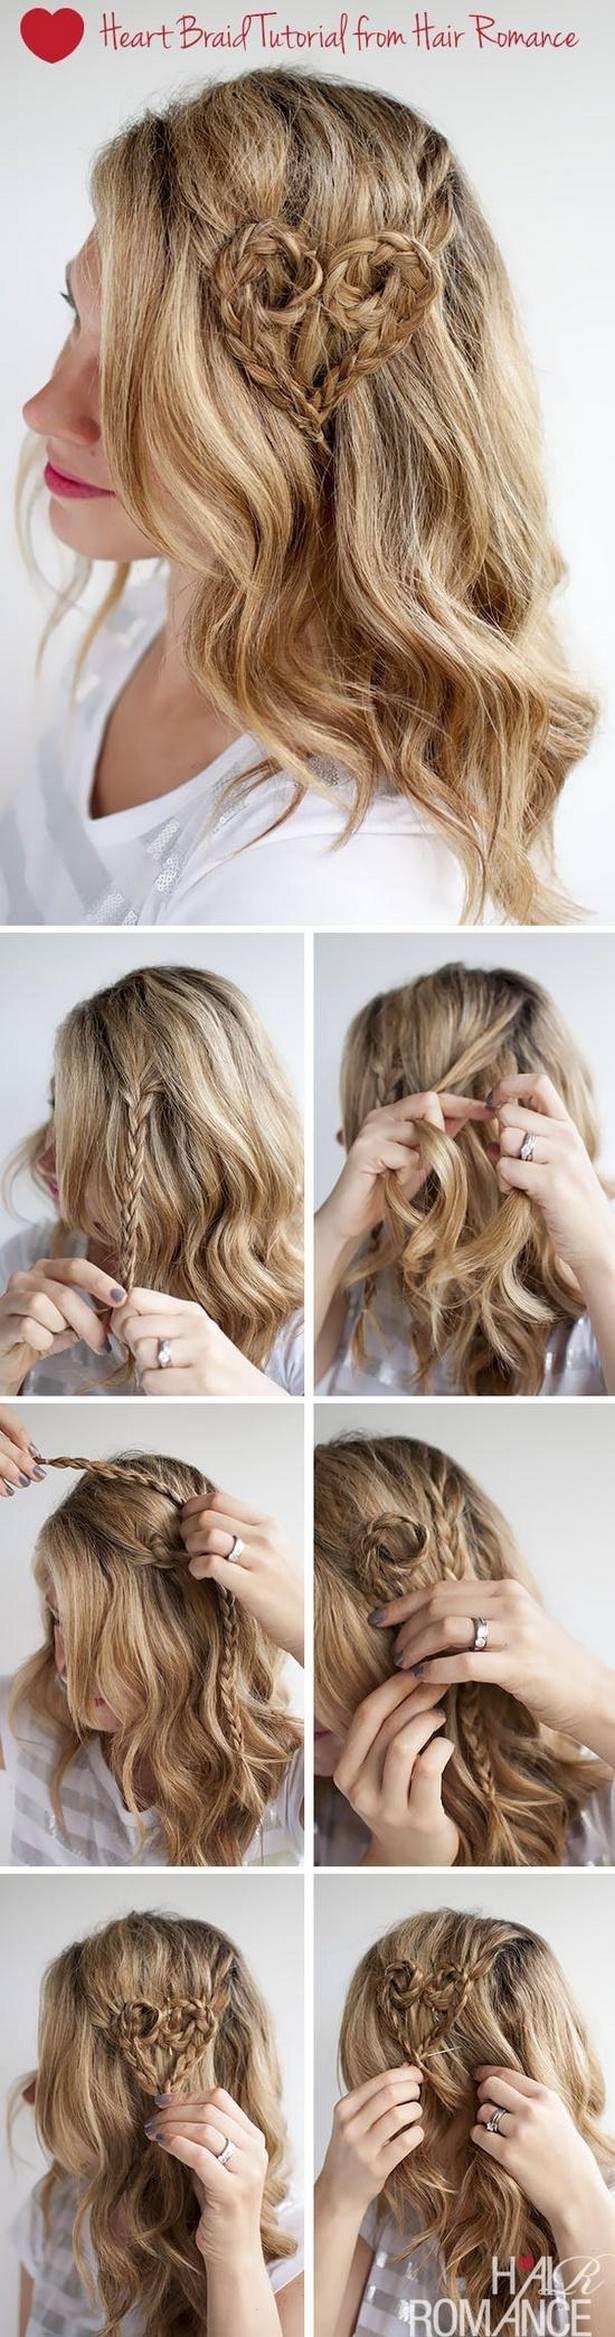 15-Fantastic-Tutorials-for-Stunning-Summer-Hairstyles-9.jpg 615×2,337 pixels